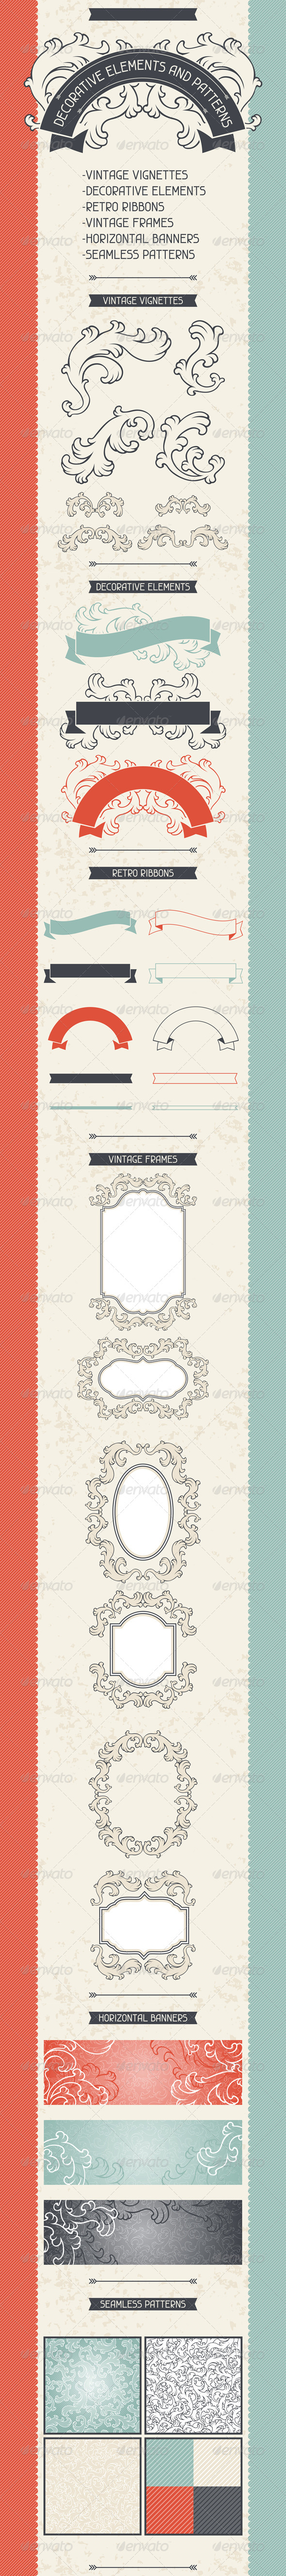 Decorative Elements and Patterns. - Decorative Vectors